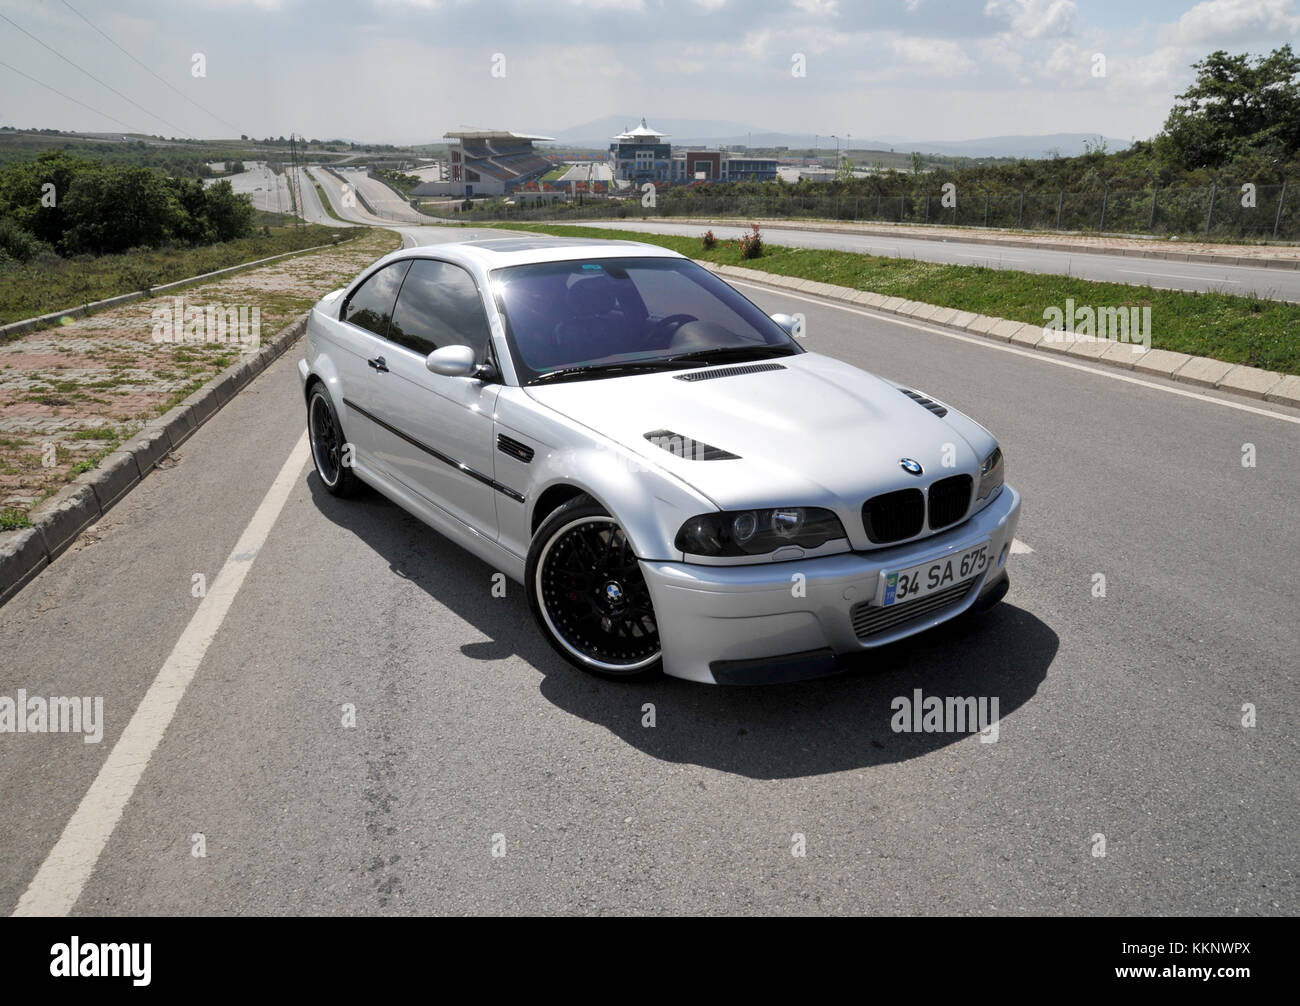 Bmw E46 M3 German Performance Car Stock Photo 167053010 Alamy